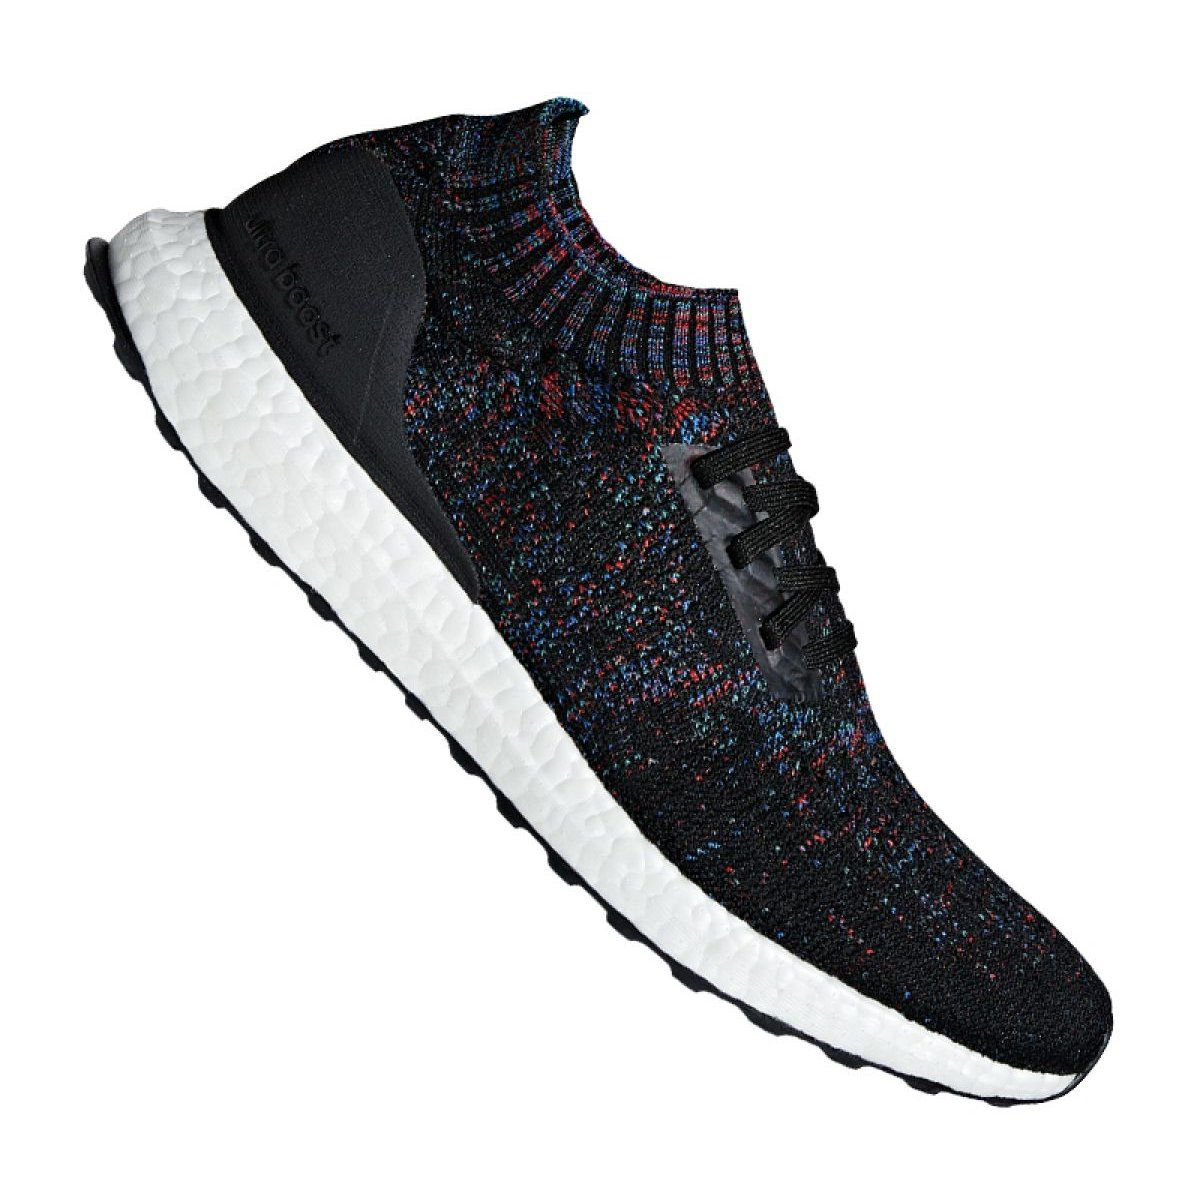 Buty Adidas Ultraboost Uncaged M B37692 Czarne Adidas Ultra Boost Ultraboost Uncaged Neutral Running Shoes